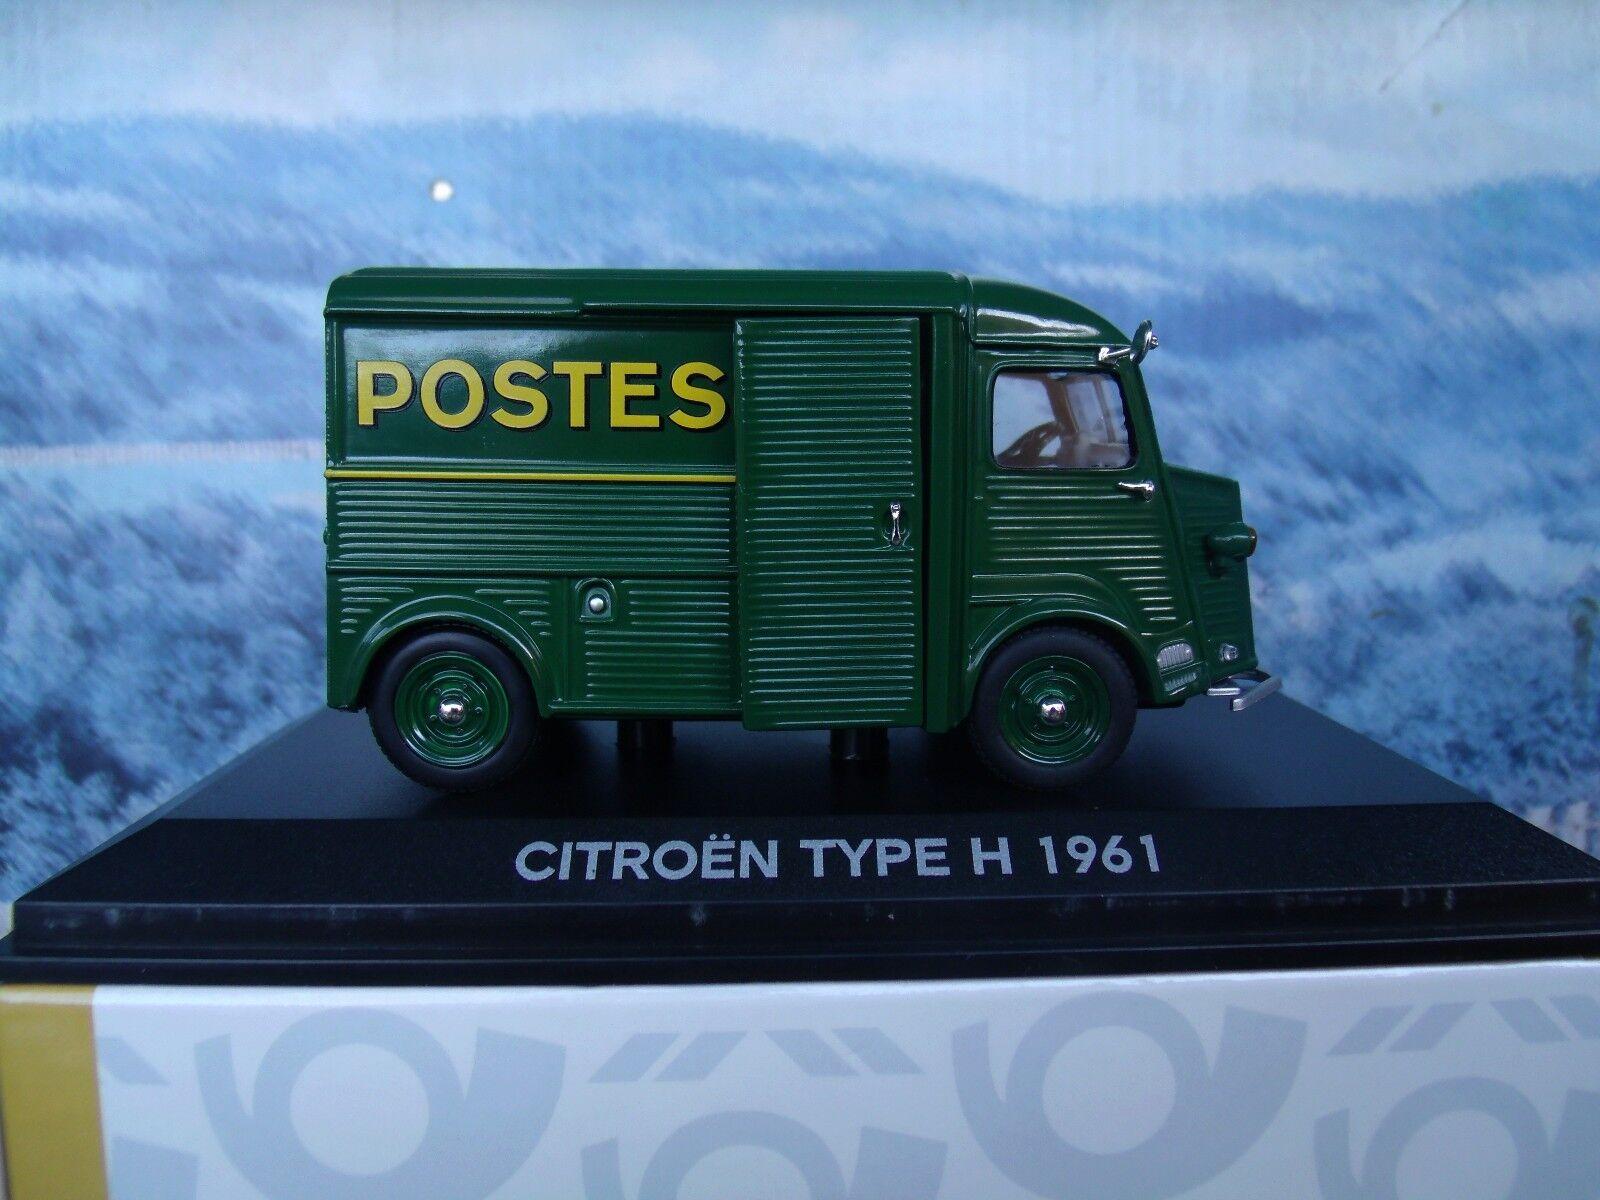 1 43  Norev  (France) Citroen type H 1961 Post